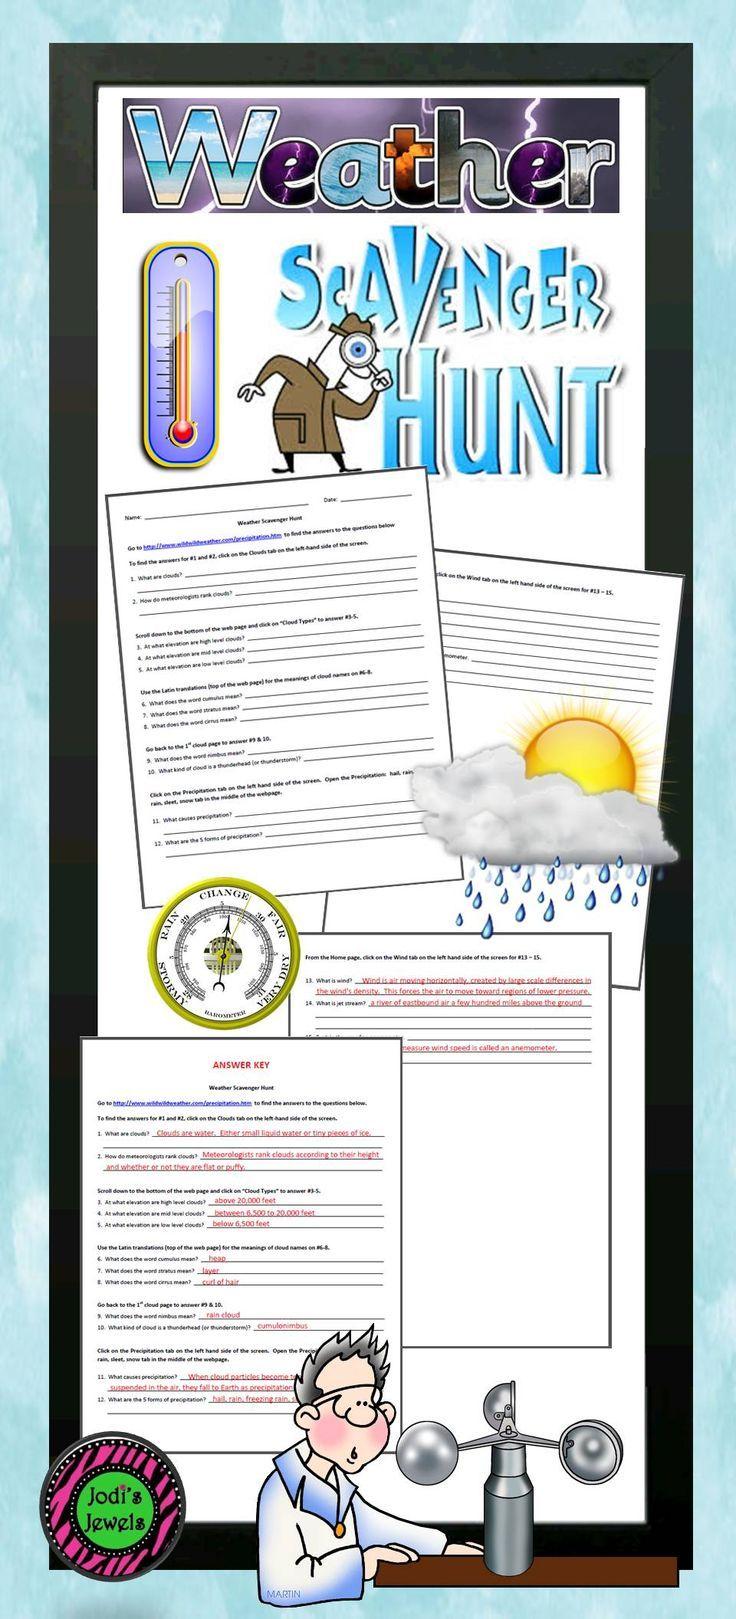 Internet Weather Scavenger Hunt Elementary Science Activities Elementary School Science Fun Science